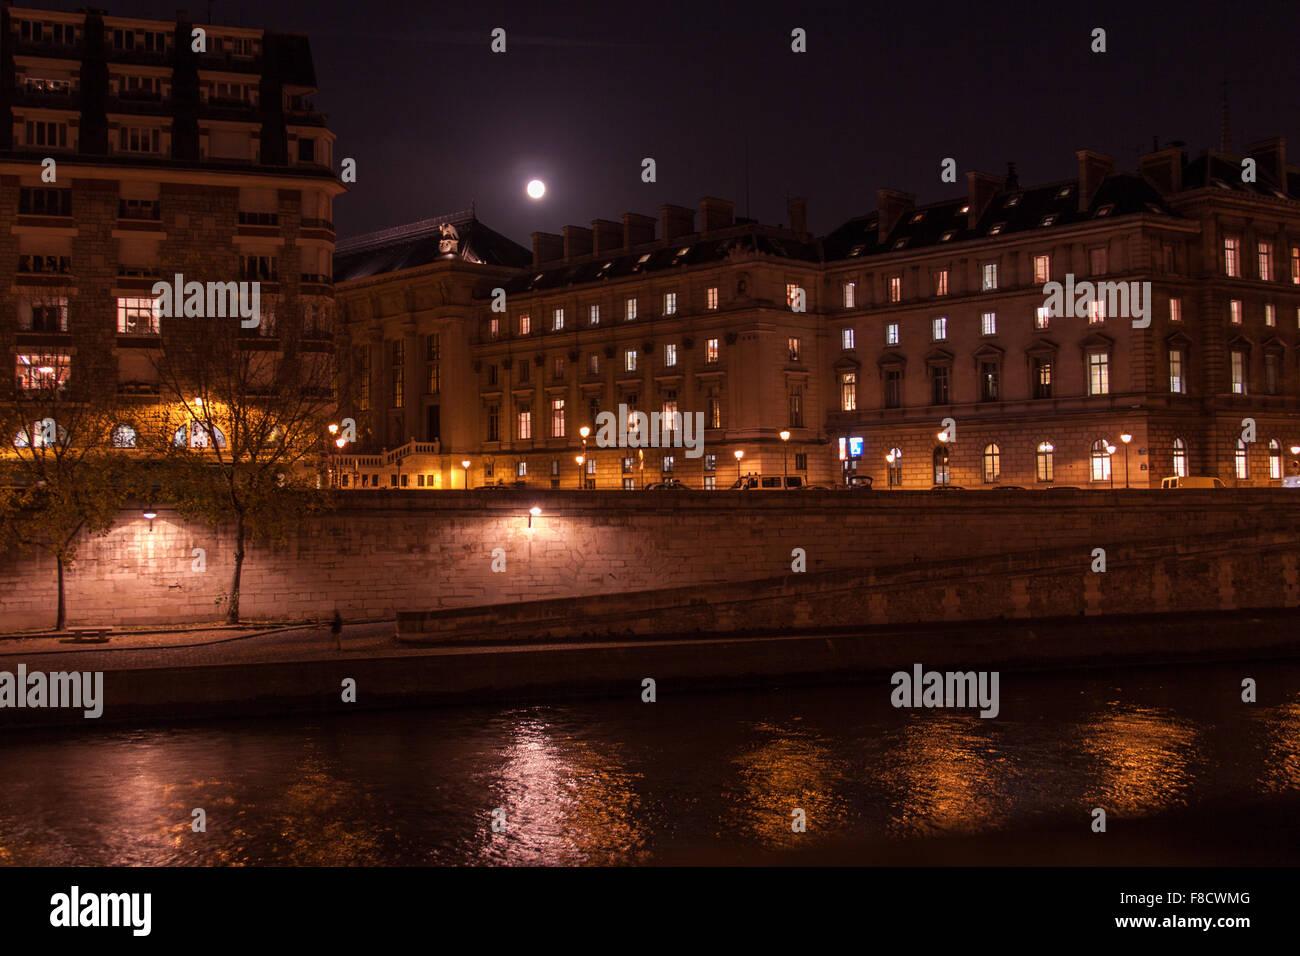 Palais Bourbon, Quai d'Orsay from across the Seine Stock Photo